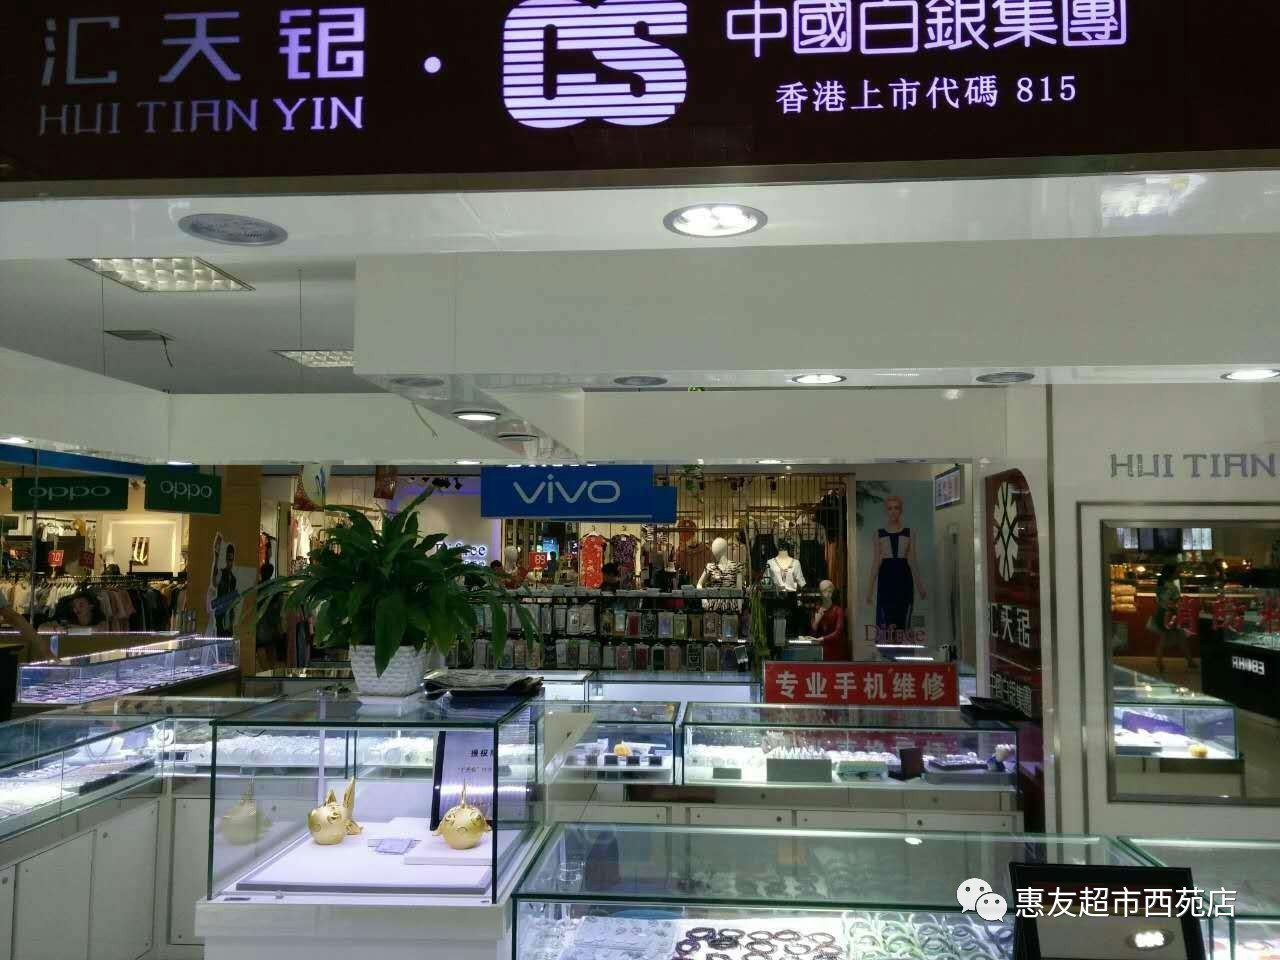 http://www.safsar.com/riyongbaihuo/444177.html